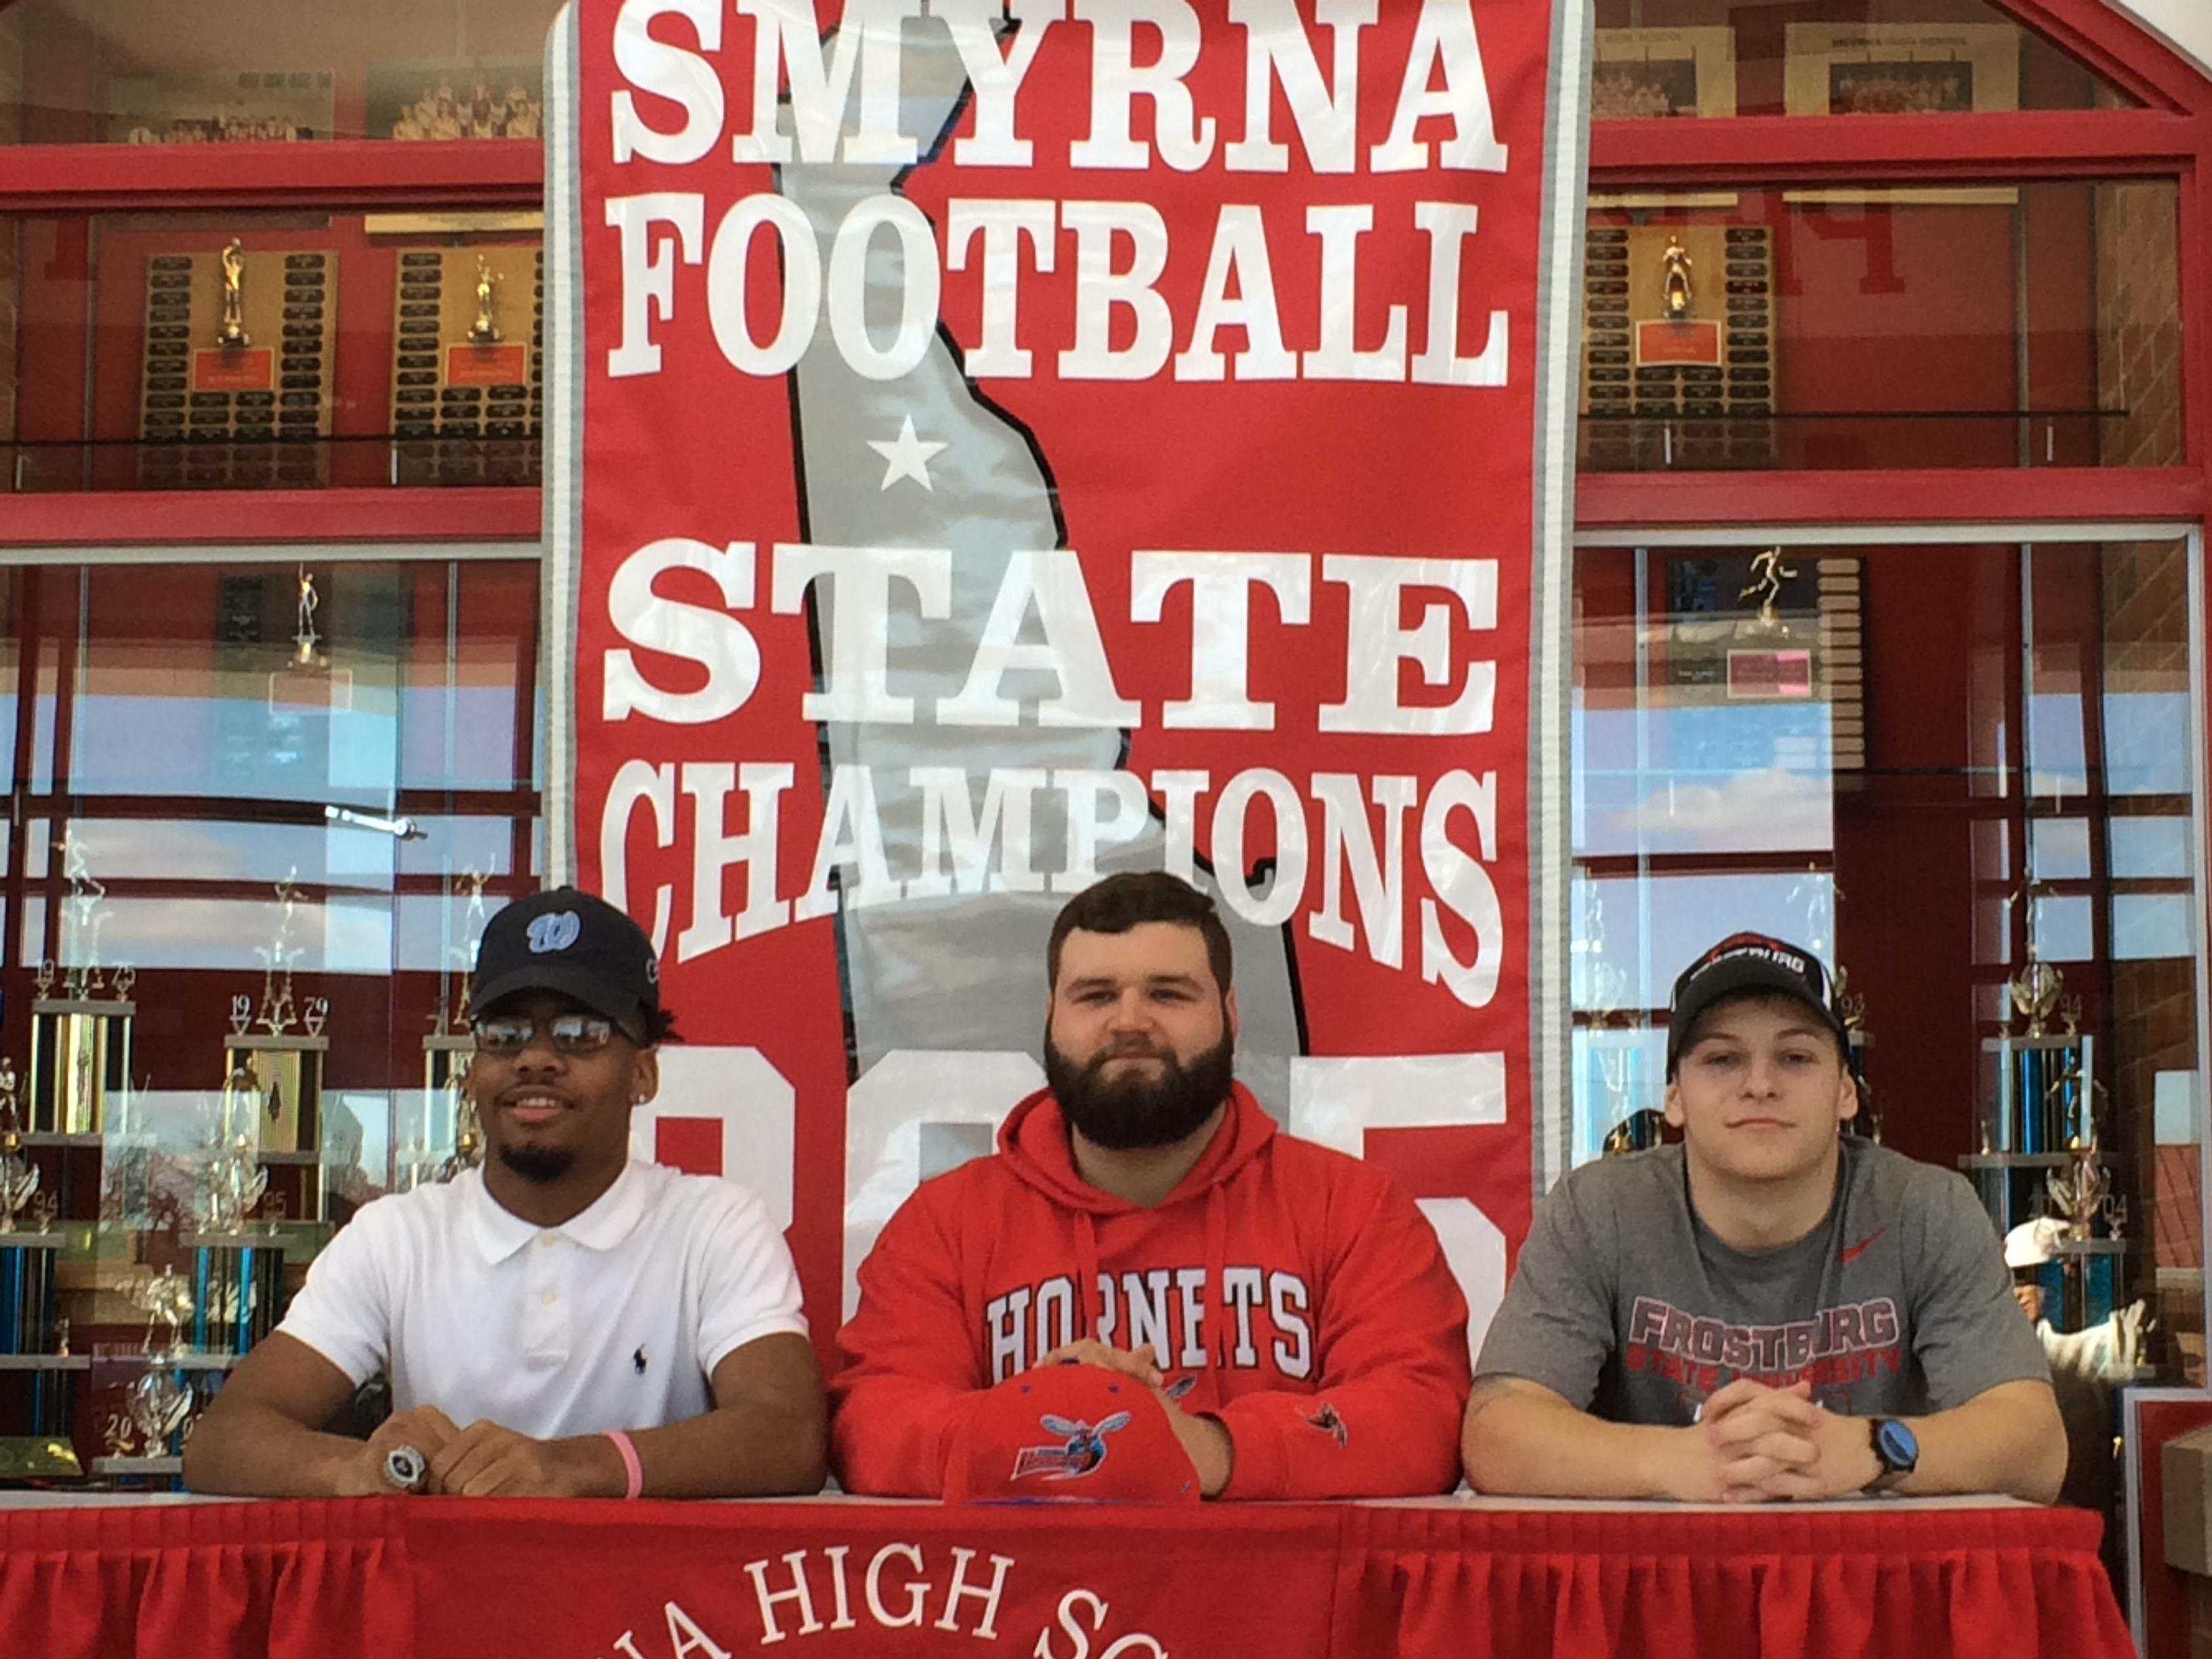 Smyrna High School Football Signing Day